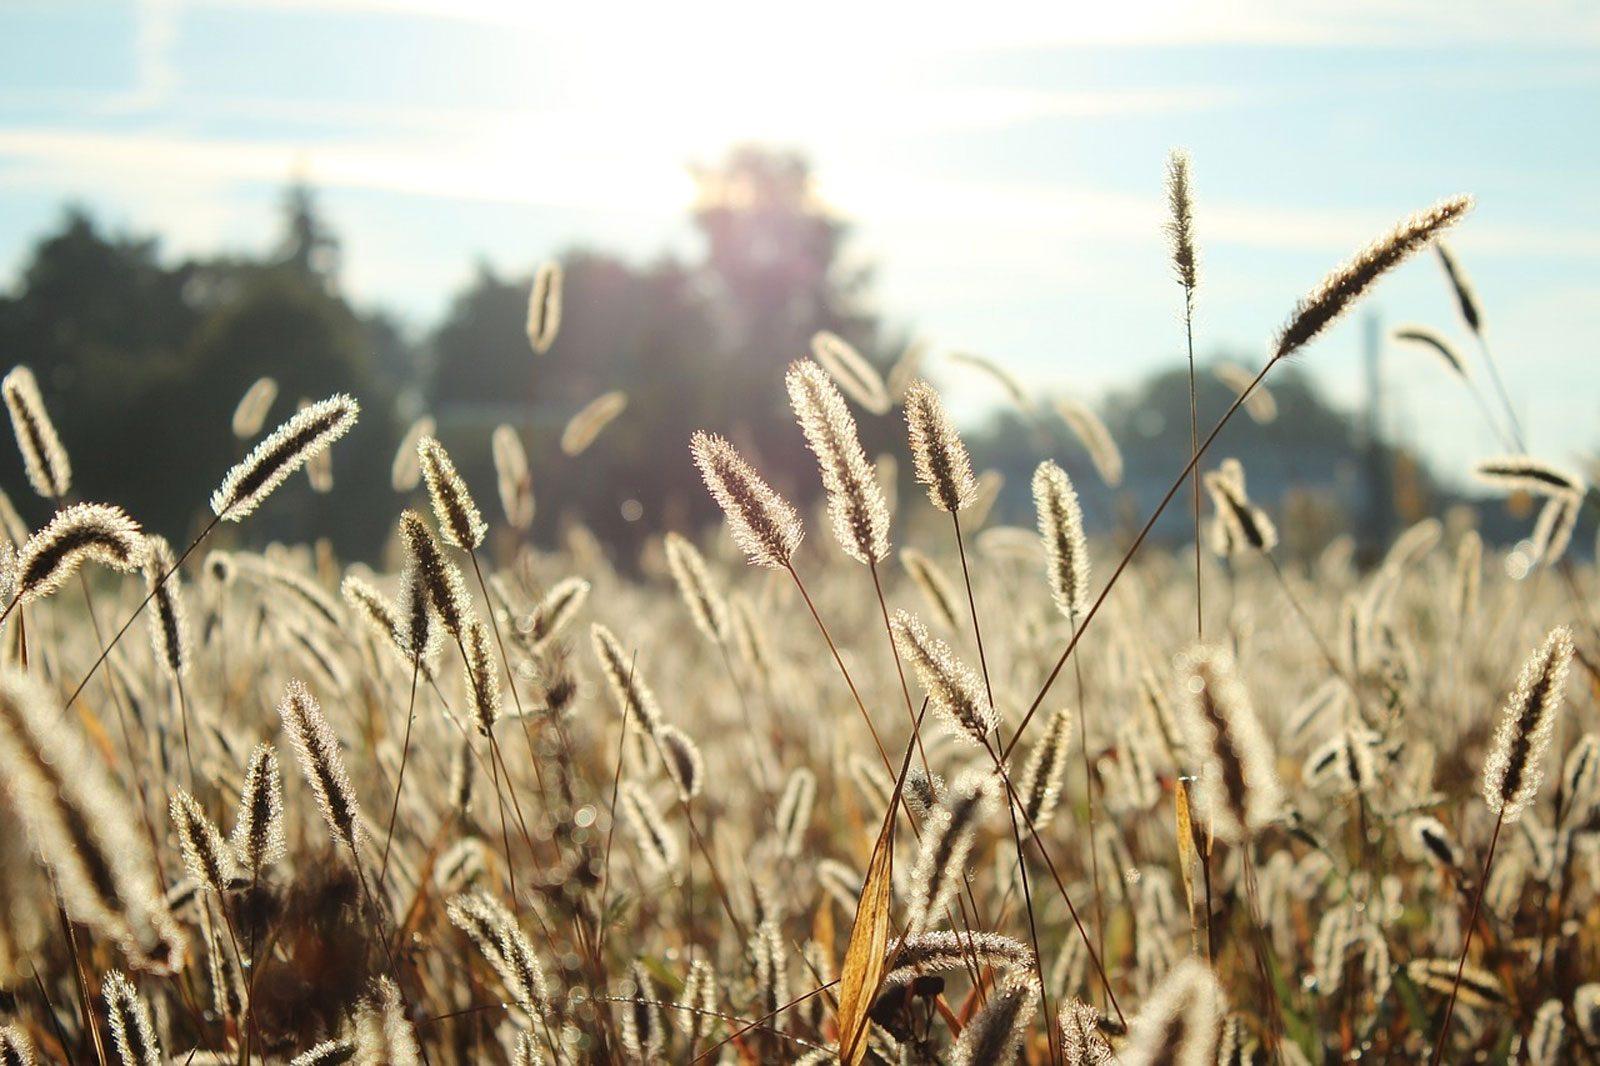 Allergies aux pollens : la Lorraine passe en alerte orange